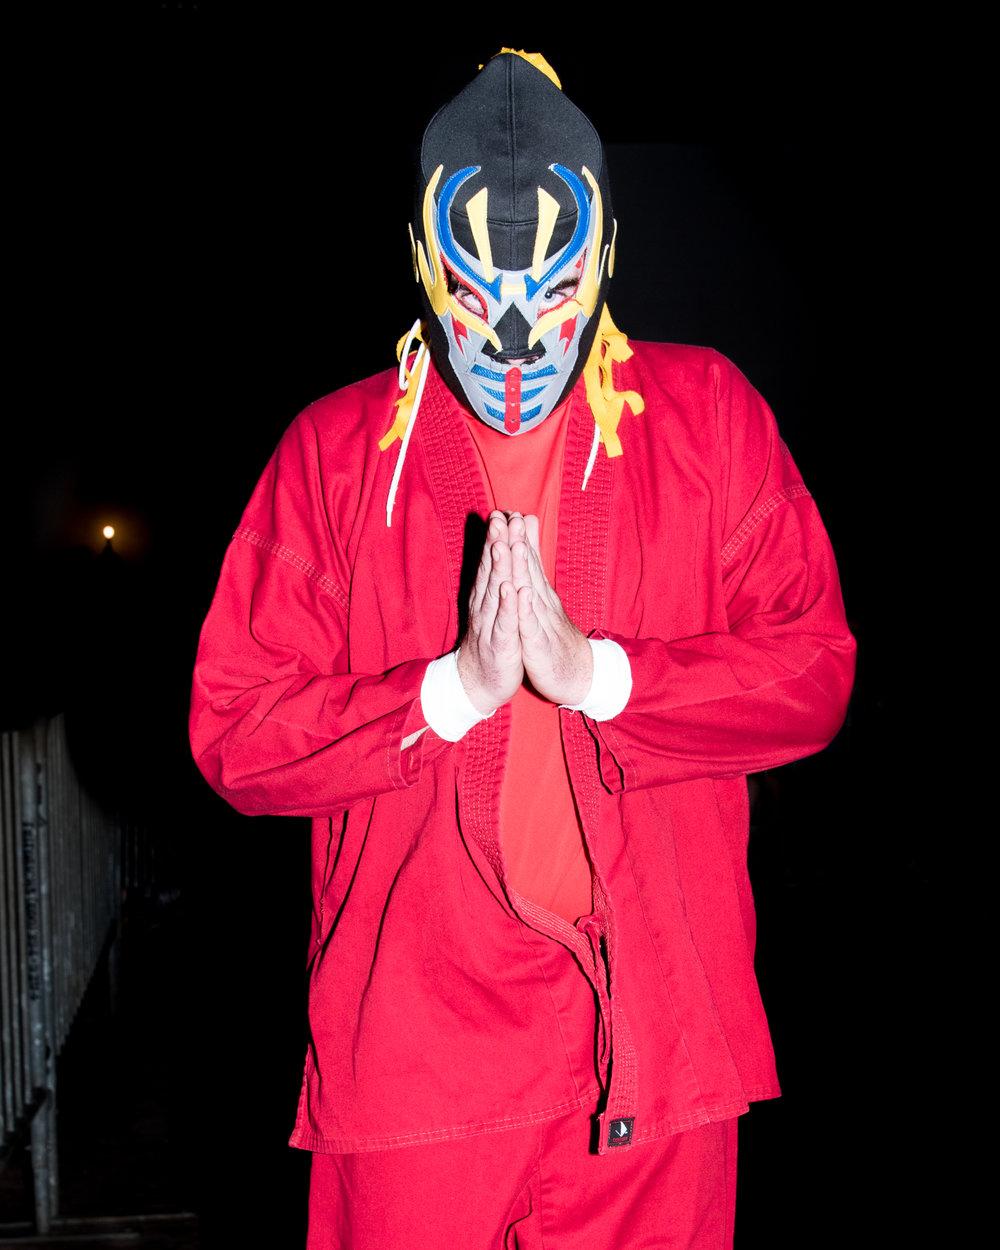 Red Ninja. Royston, GA. 2017. Digital Image.